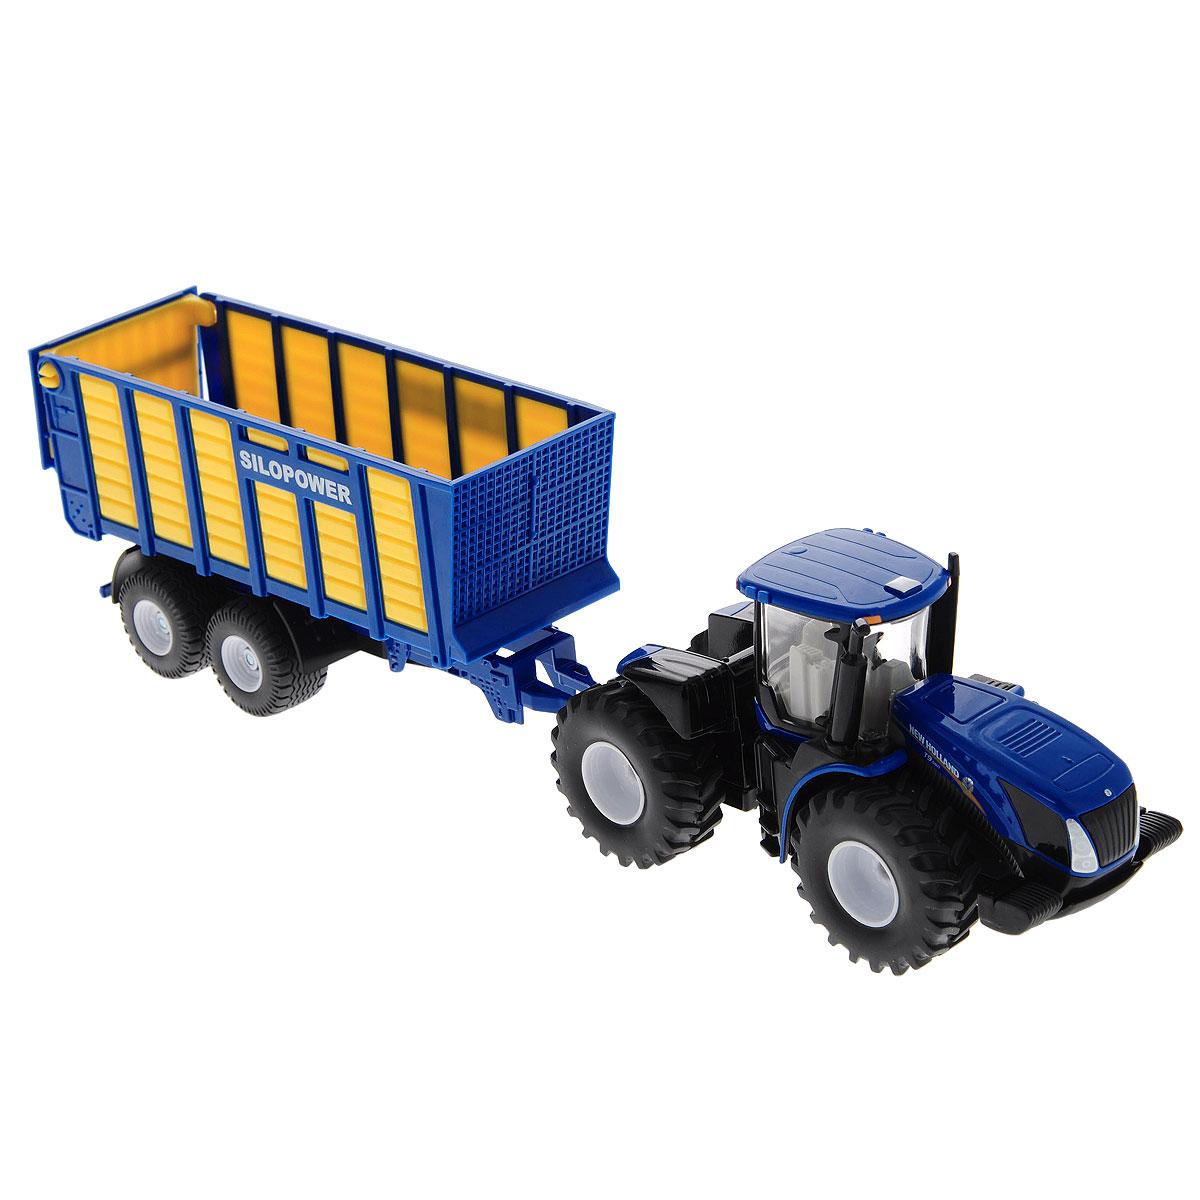 Siku Трактор New Holland T с прицепом siku трактор claas с прицепом oehler